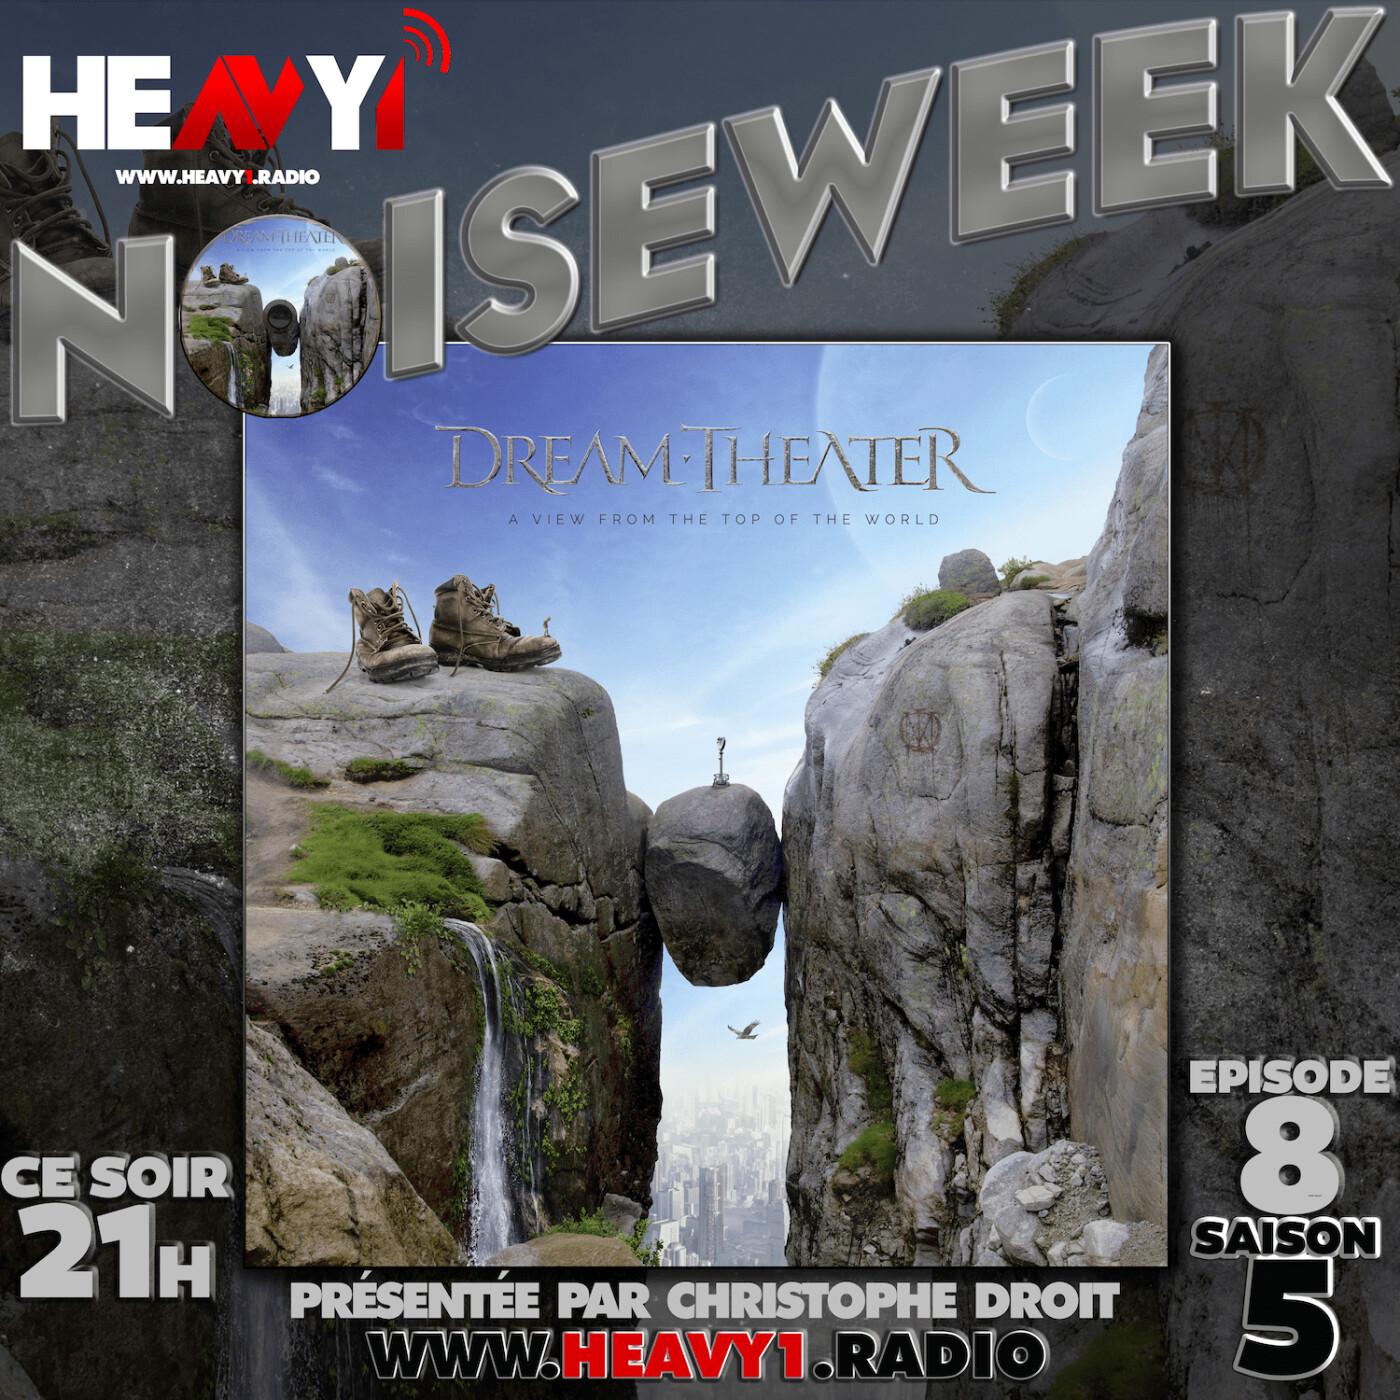 Noiseweek #8 Saison 5